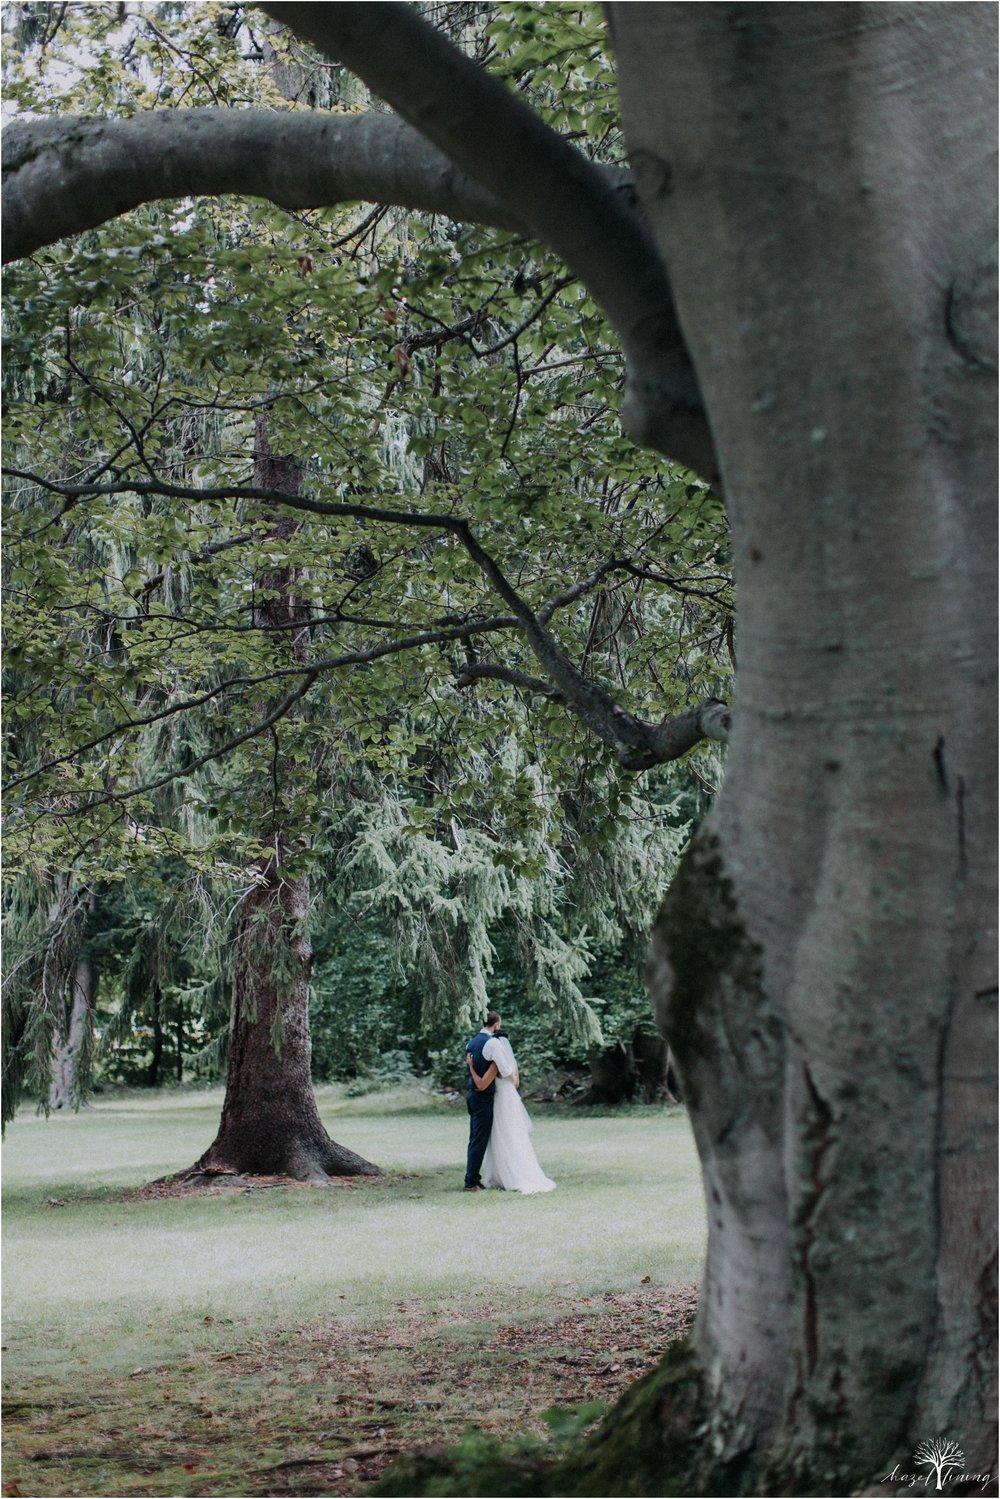 mariah-kreyling-samuel-sherratt-sherrattwiththeworld-peirce-farm-at-witch-hill-boston-massachusetts-wedding-photography-hazel-lining-travel-wedding-elopement-photography_0103.jpg